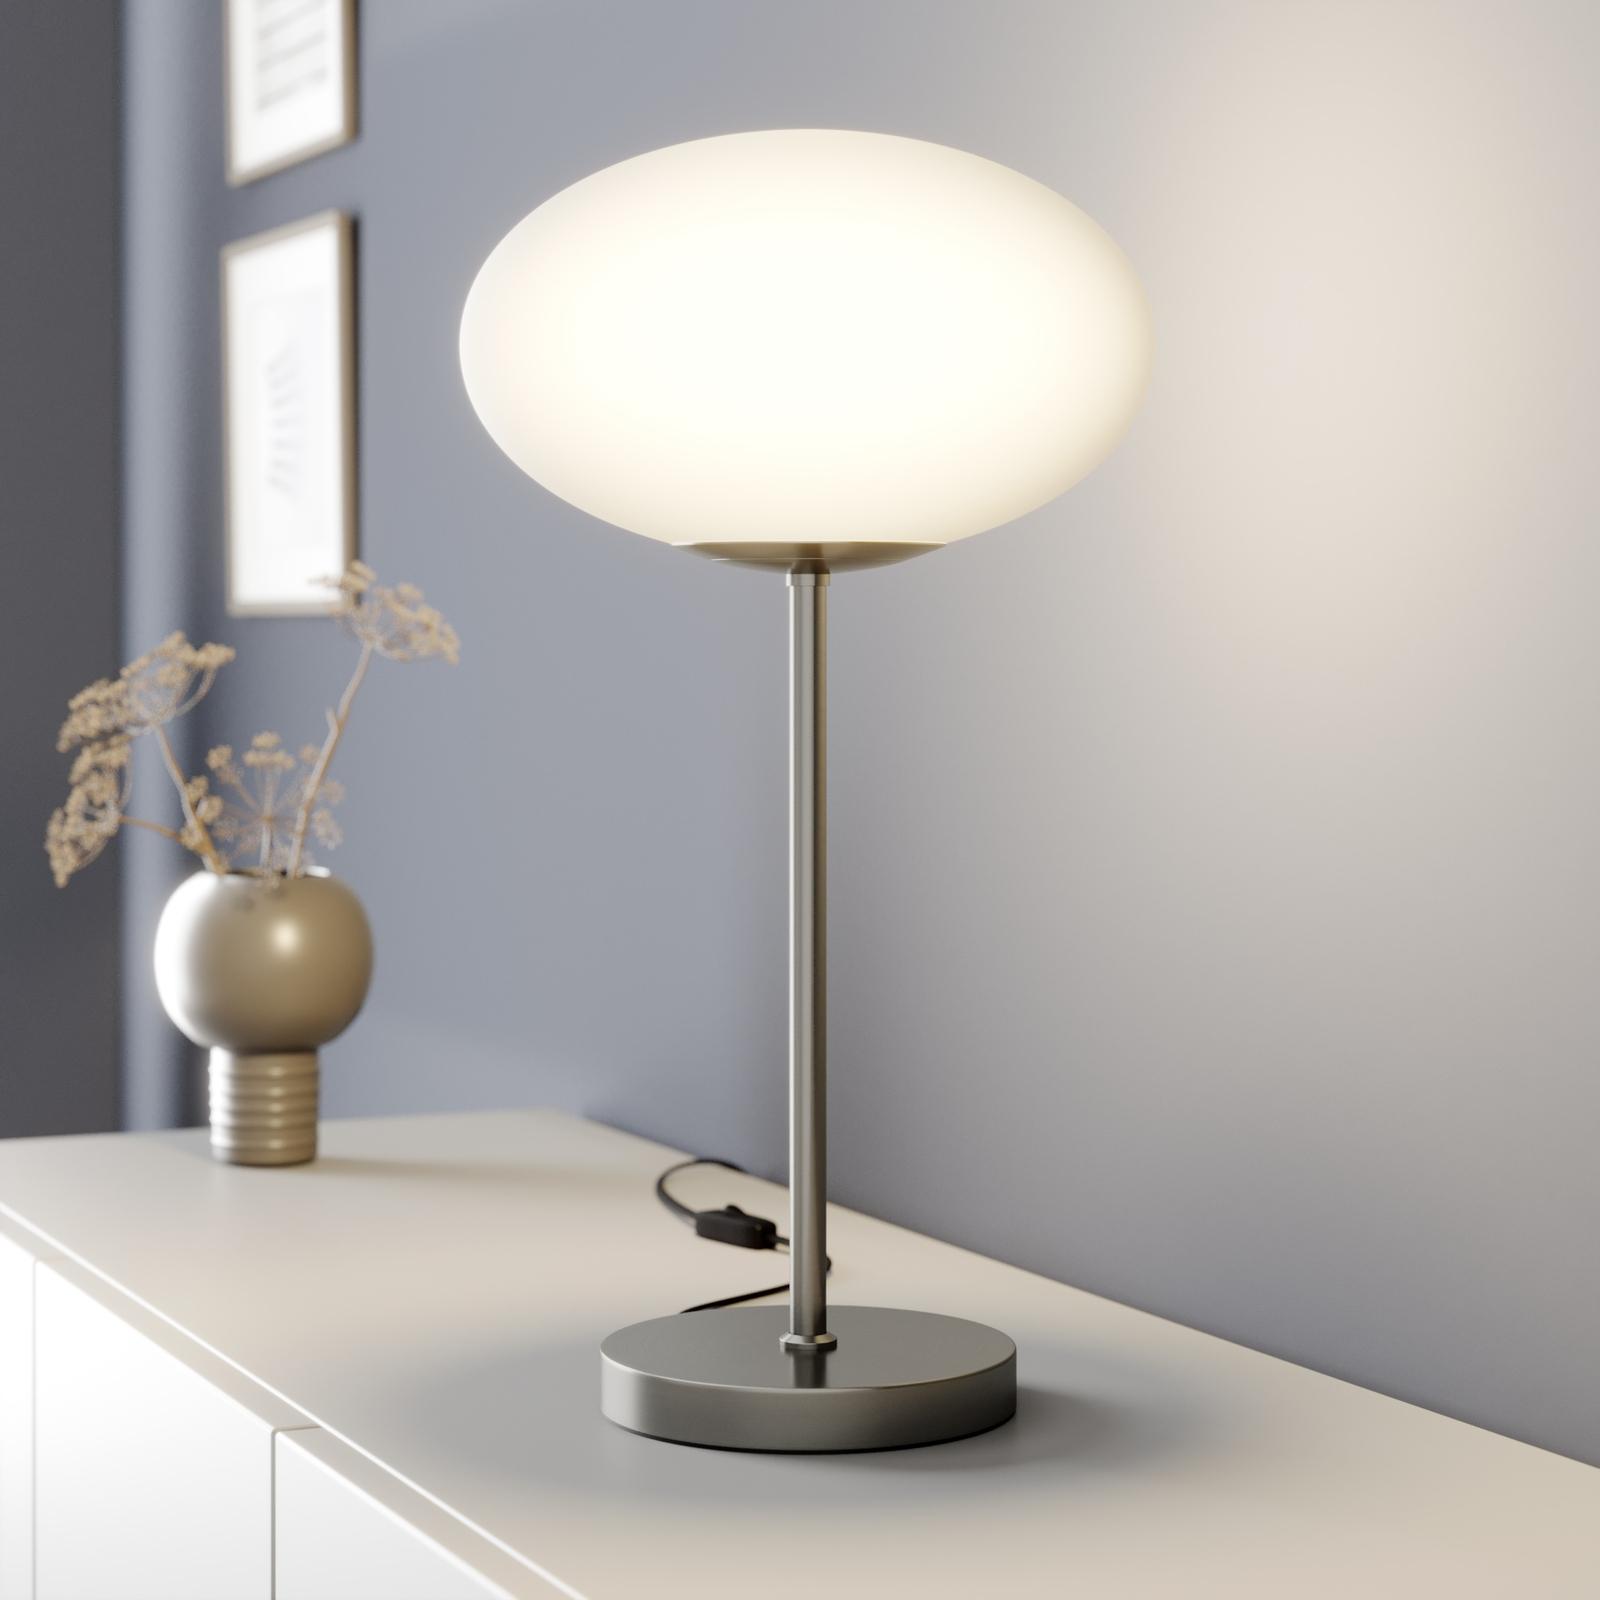 Lindby Sonika lampada da tavolo, 53 cm